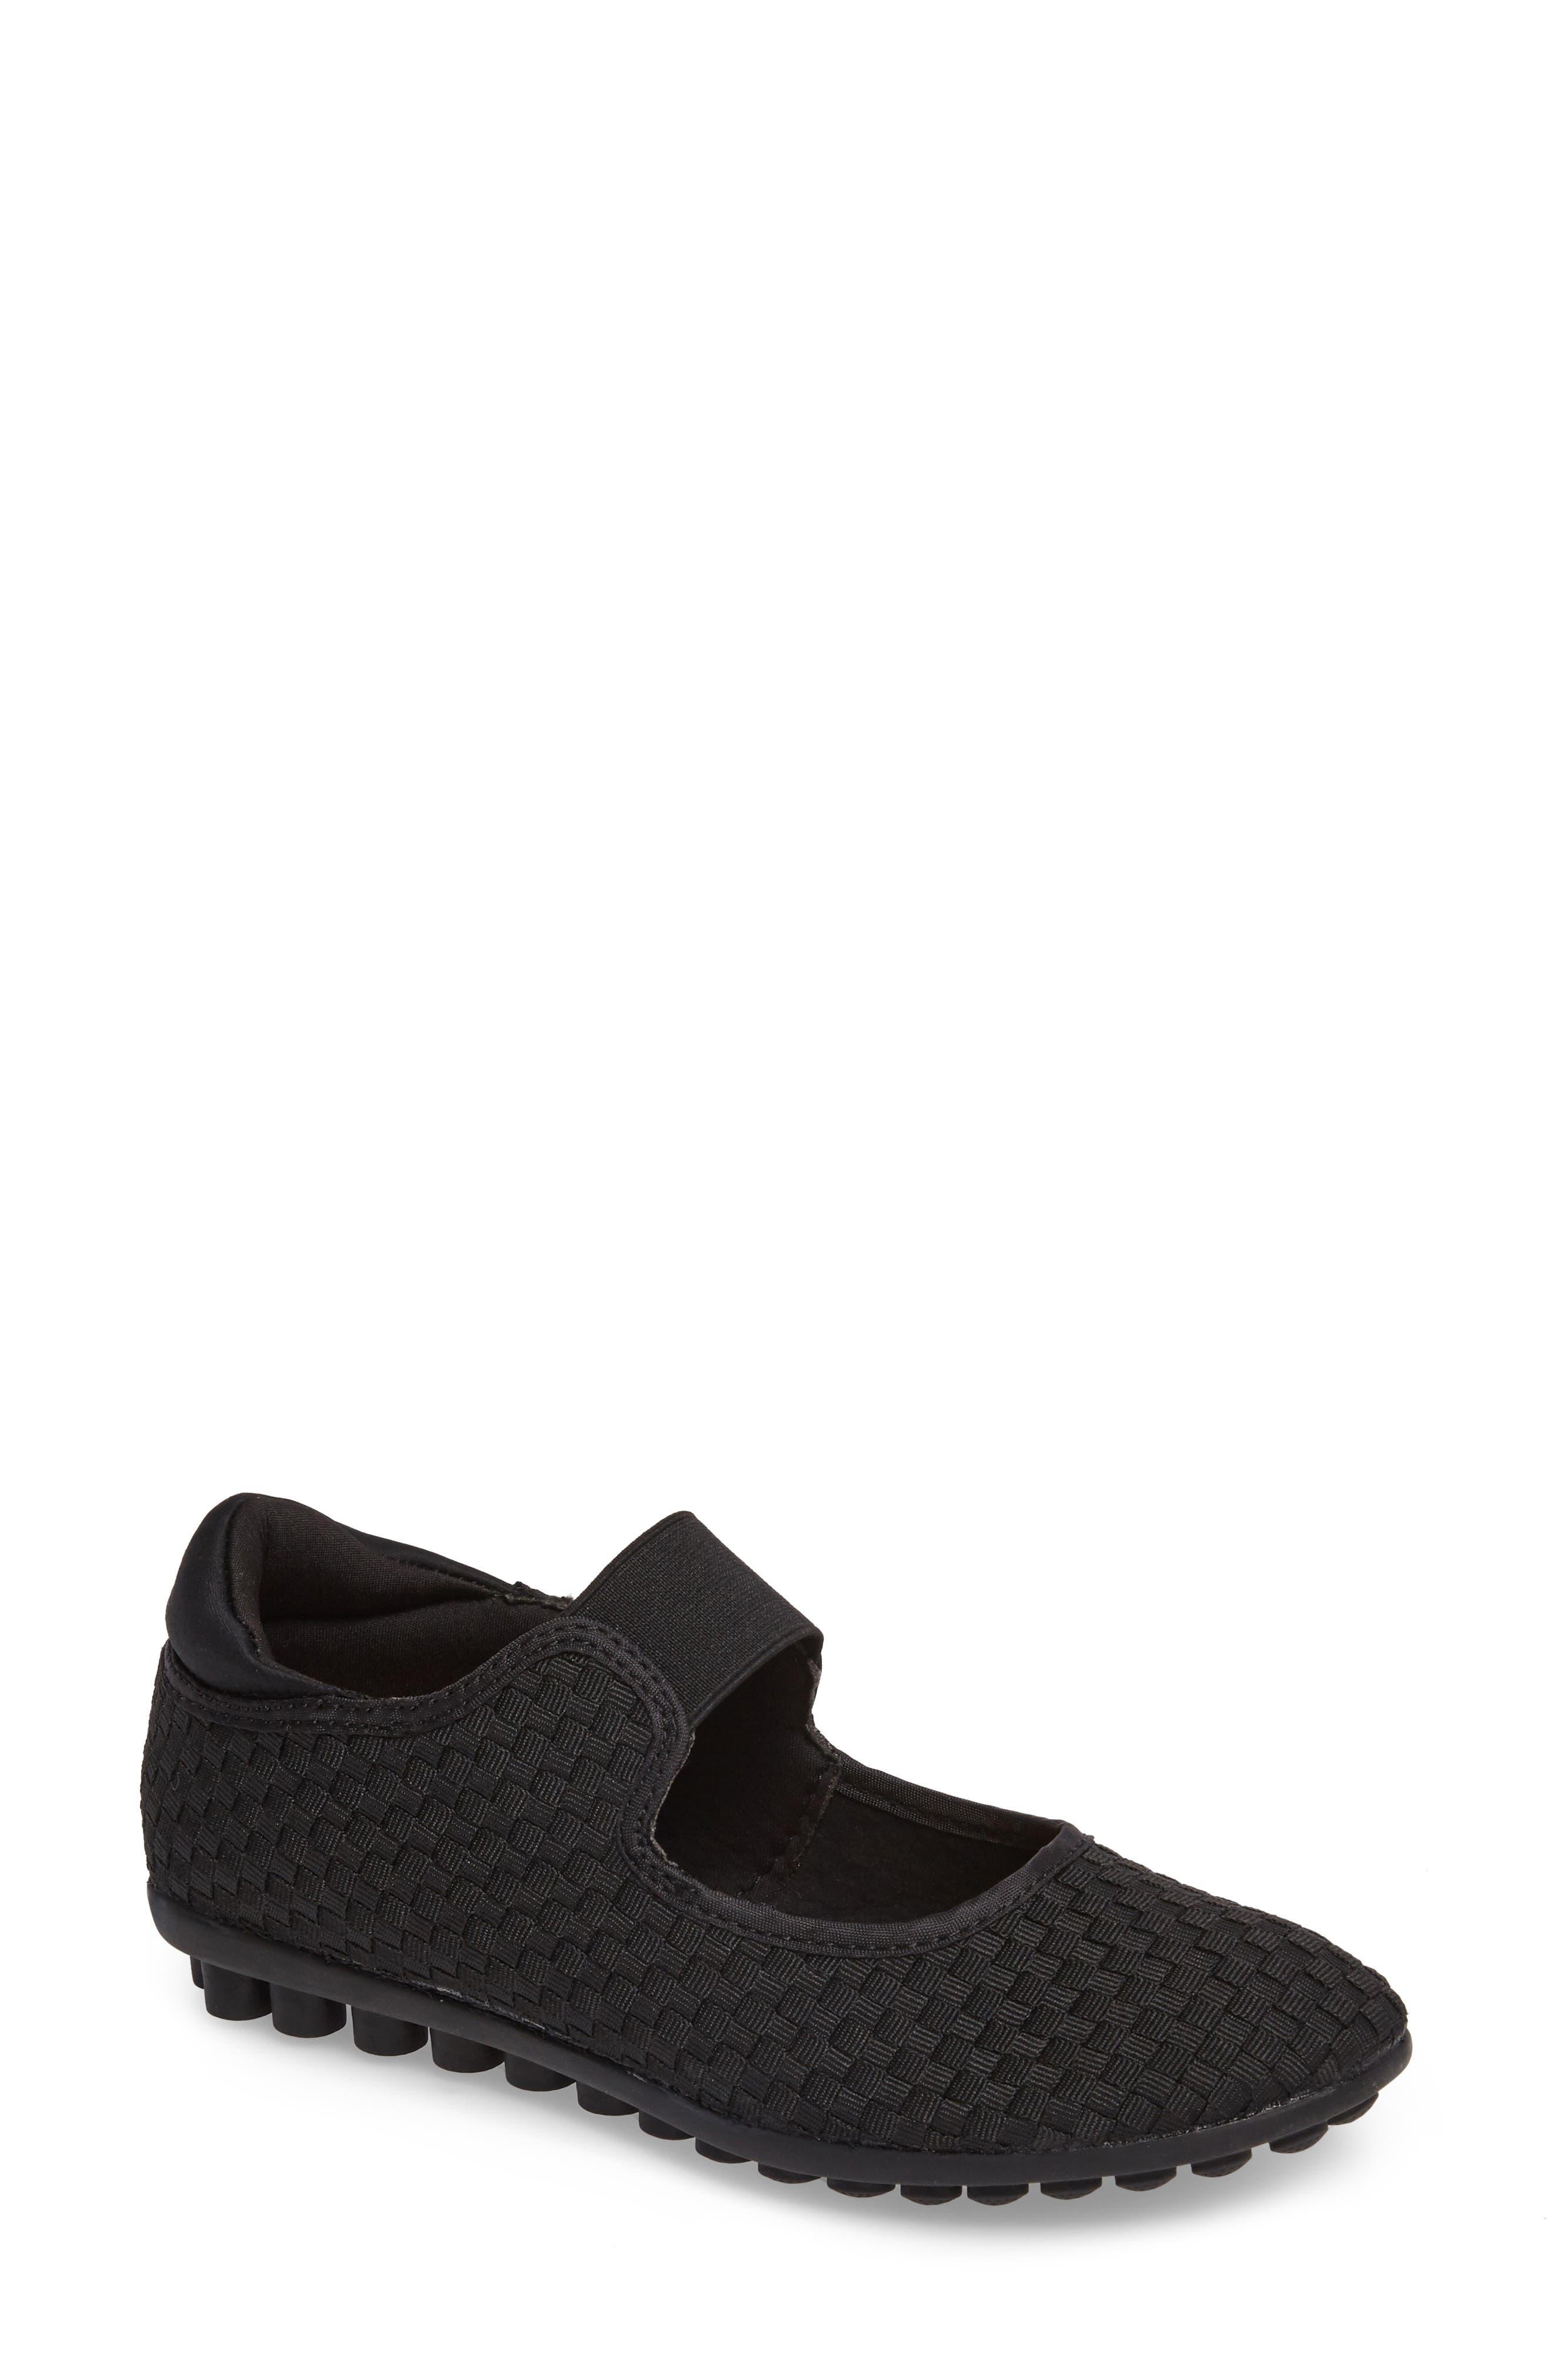 Bernie Mev Kendra Mary Jane Sneaker, Black